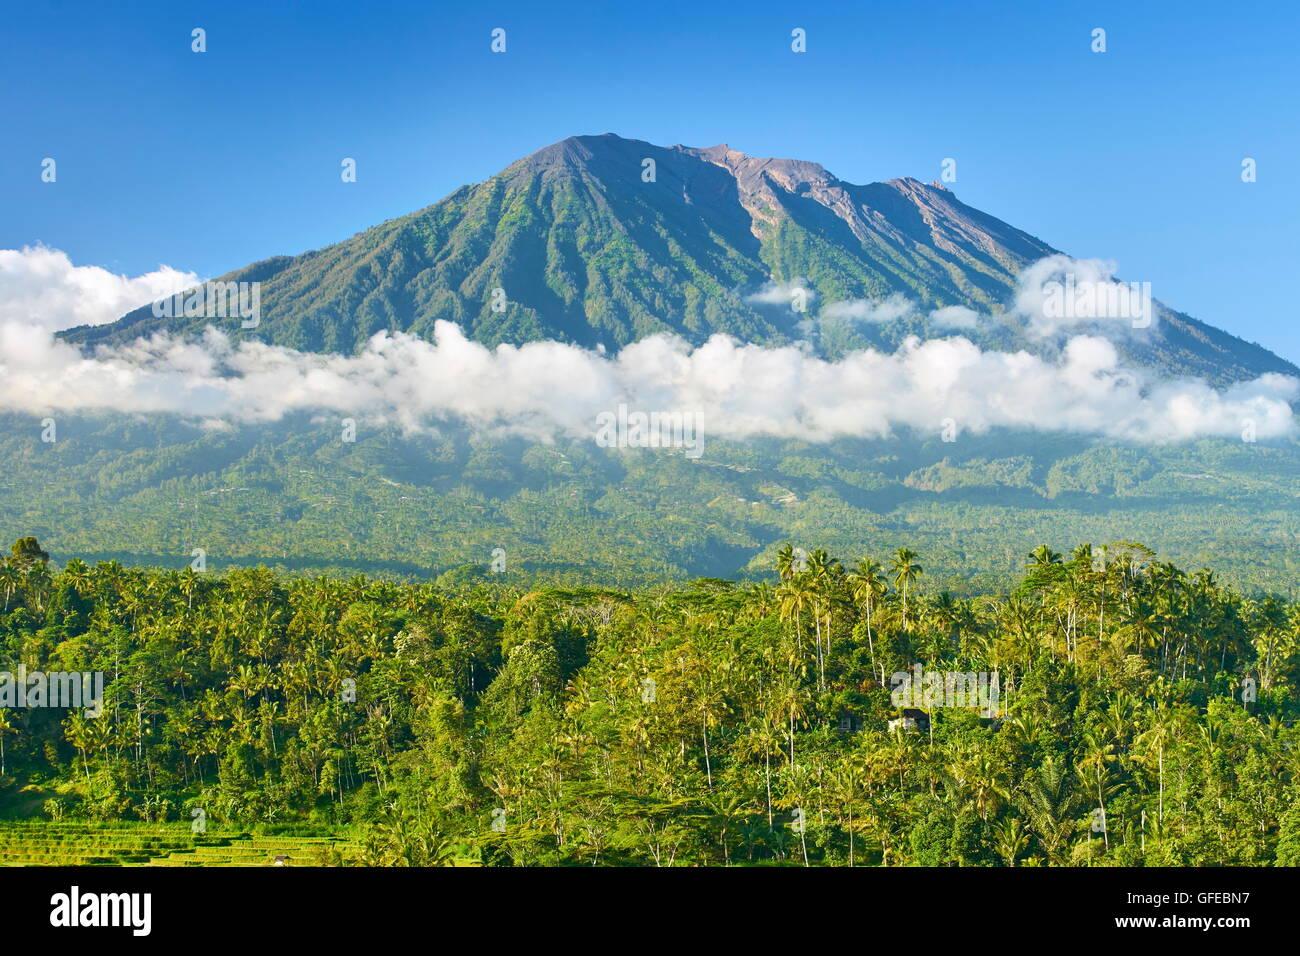 El paisaje del Volcán Gunung Agung, Bali, Indonesia Imagen De Stock